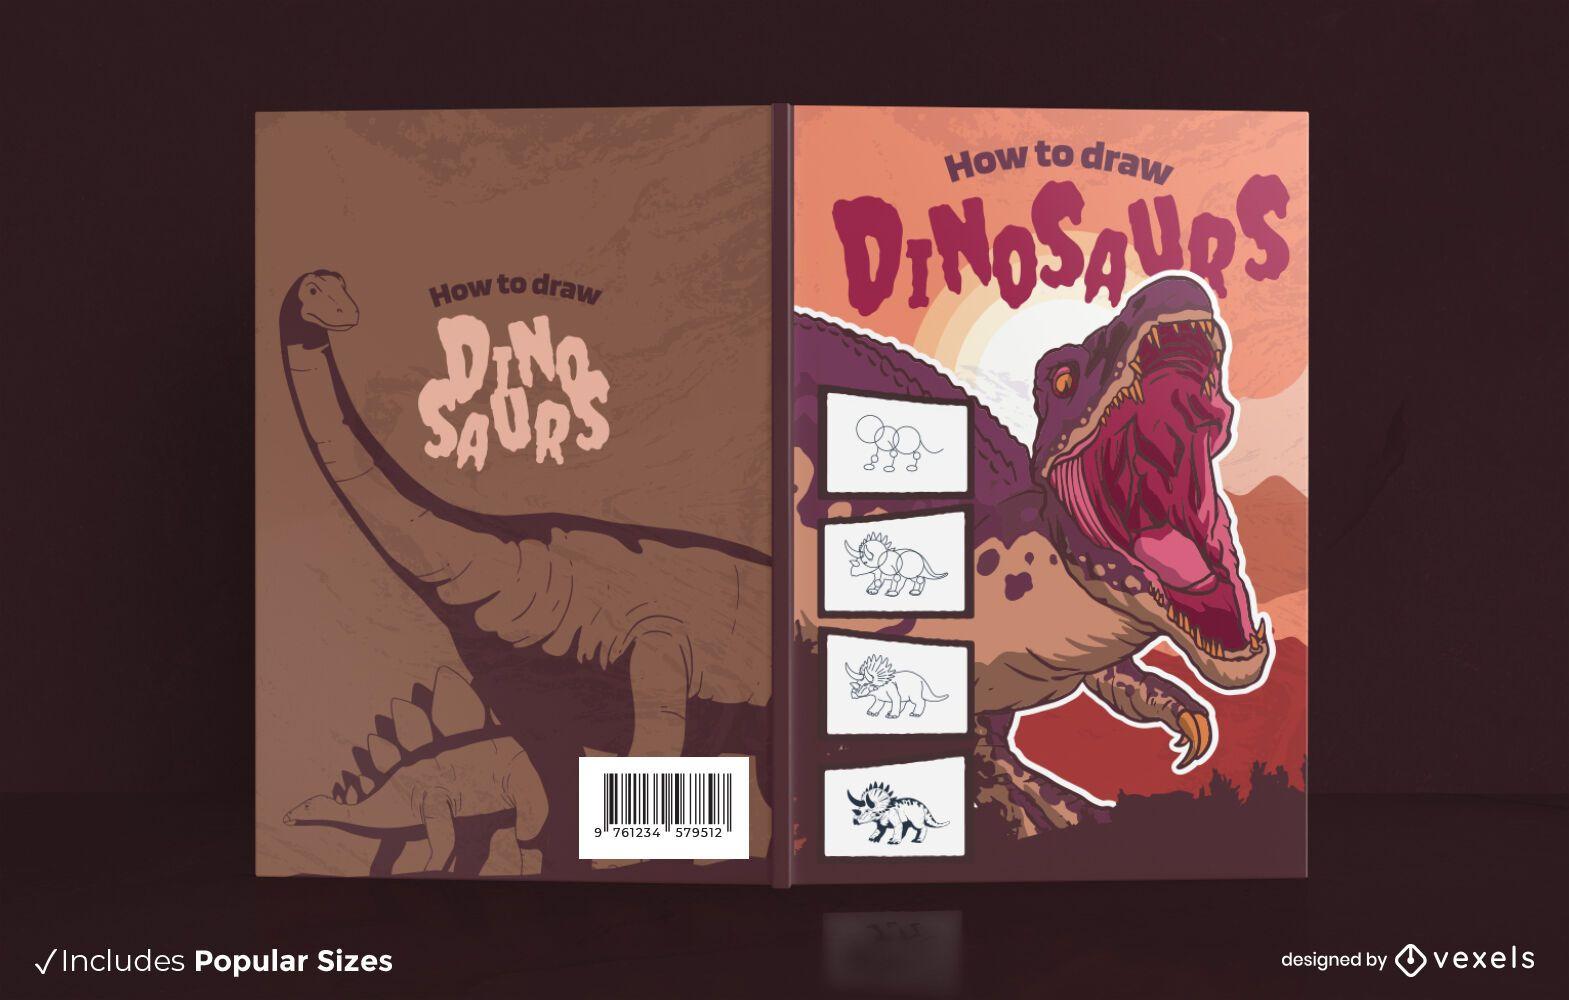 T-rex dinosaur drawing book cover design